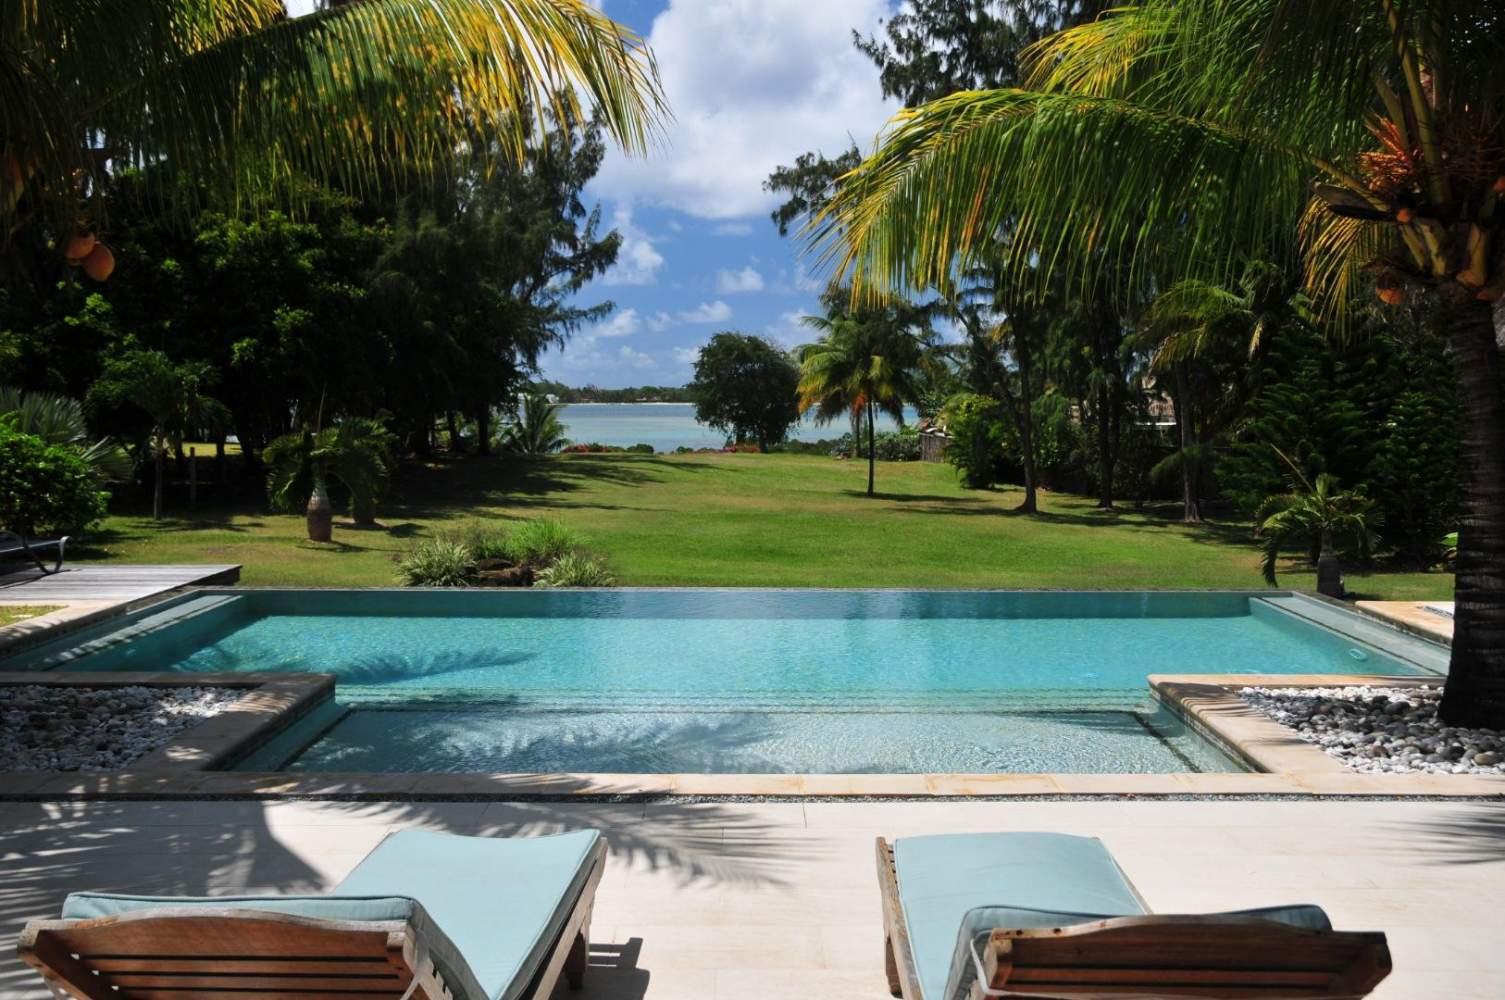 location villa hammamet avec piscine priv e et vue mer en